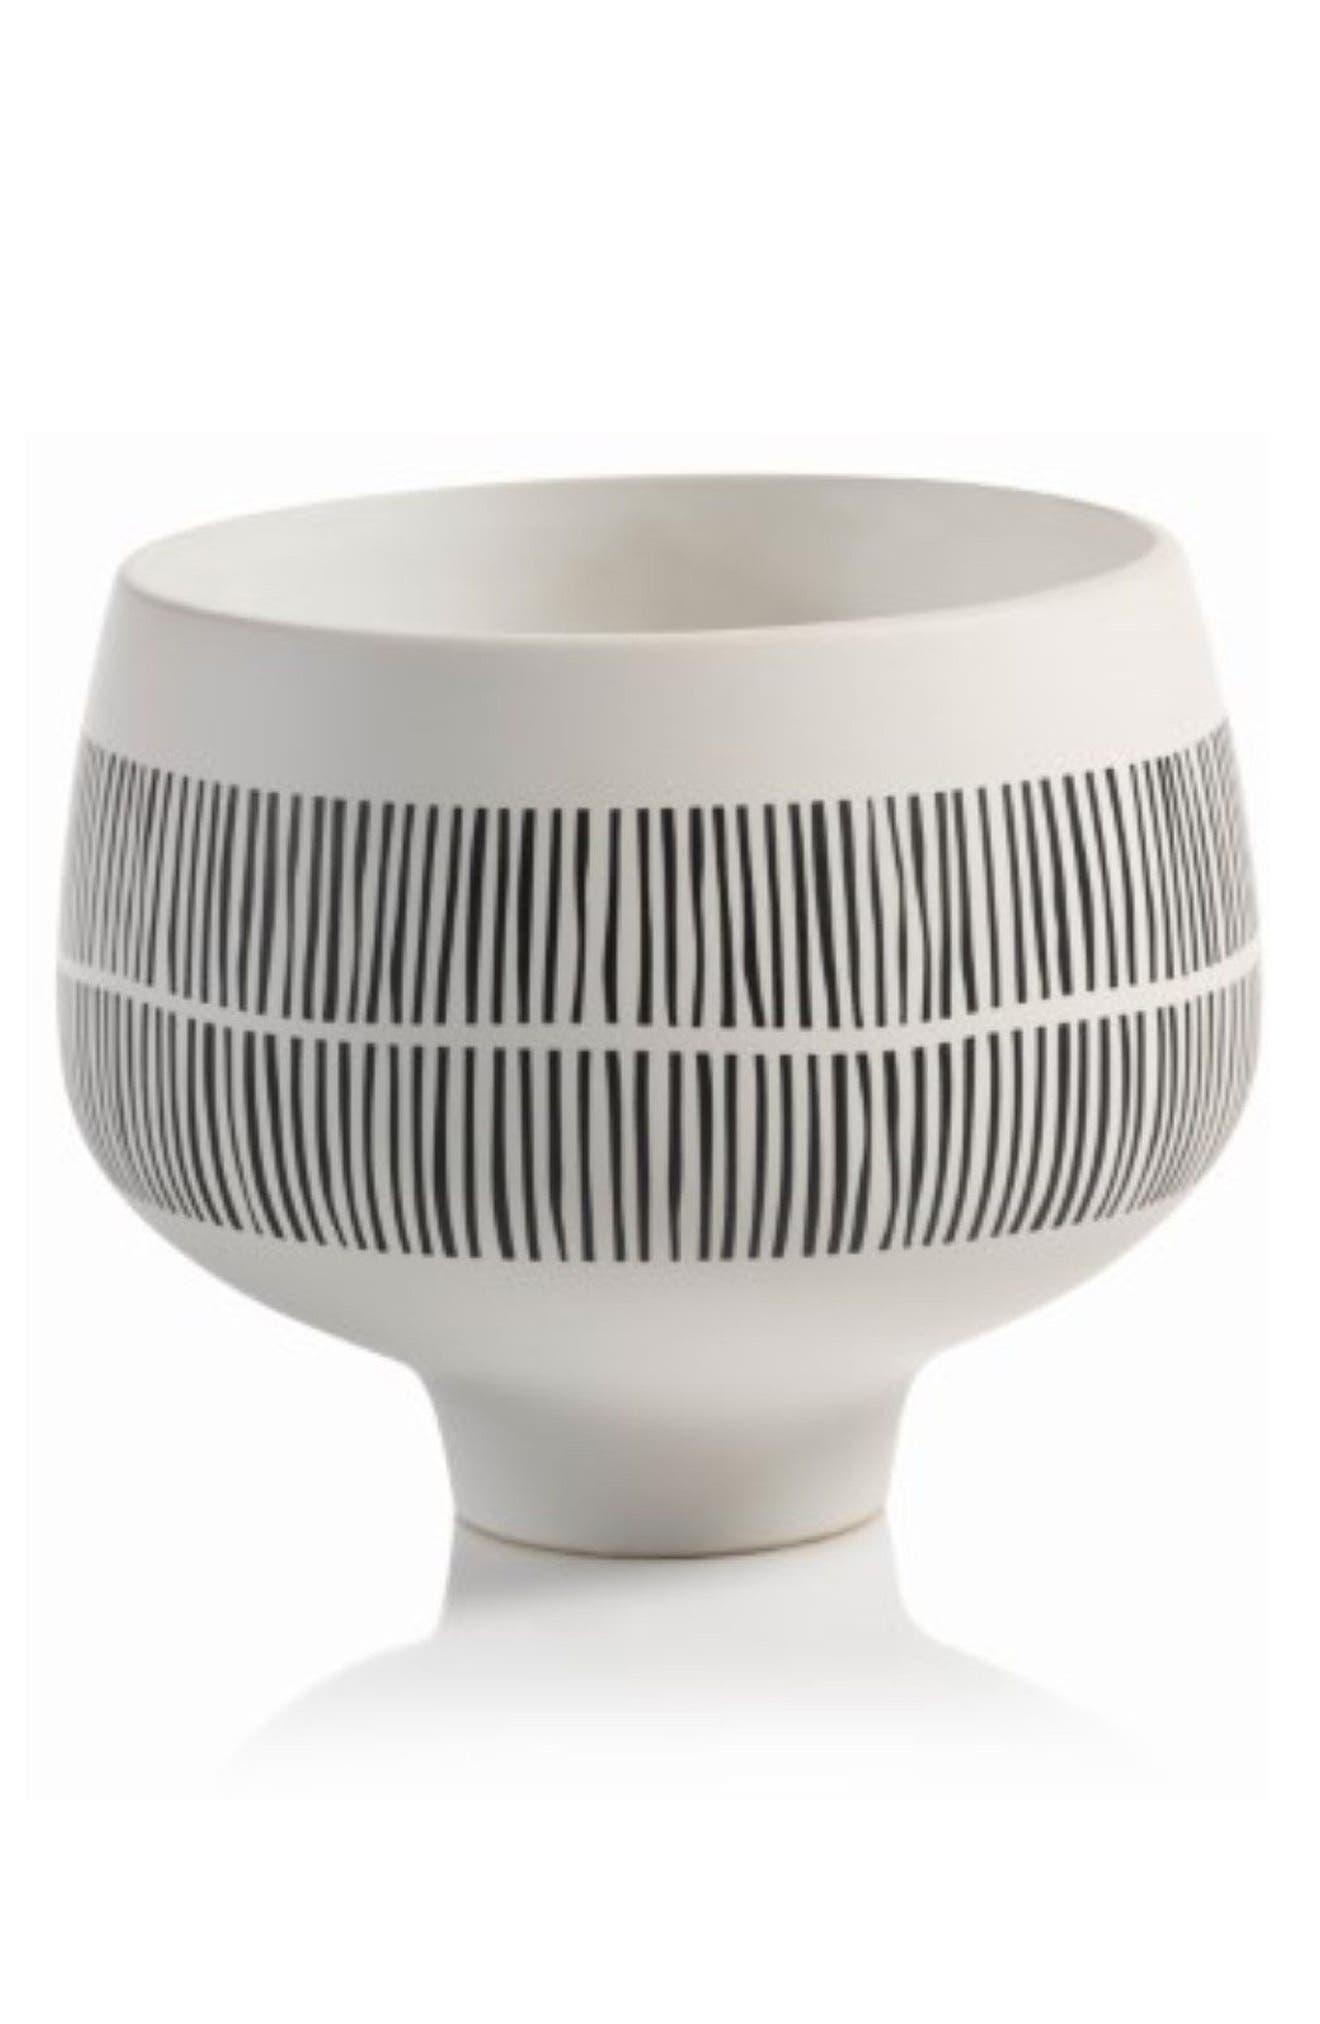 Marquesa Ceramic Pedestal Bowl,                             Main thumbnail 1, color,                             White